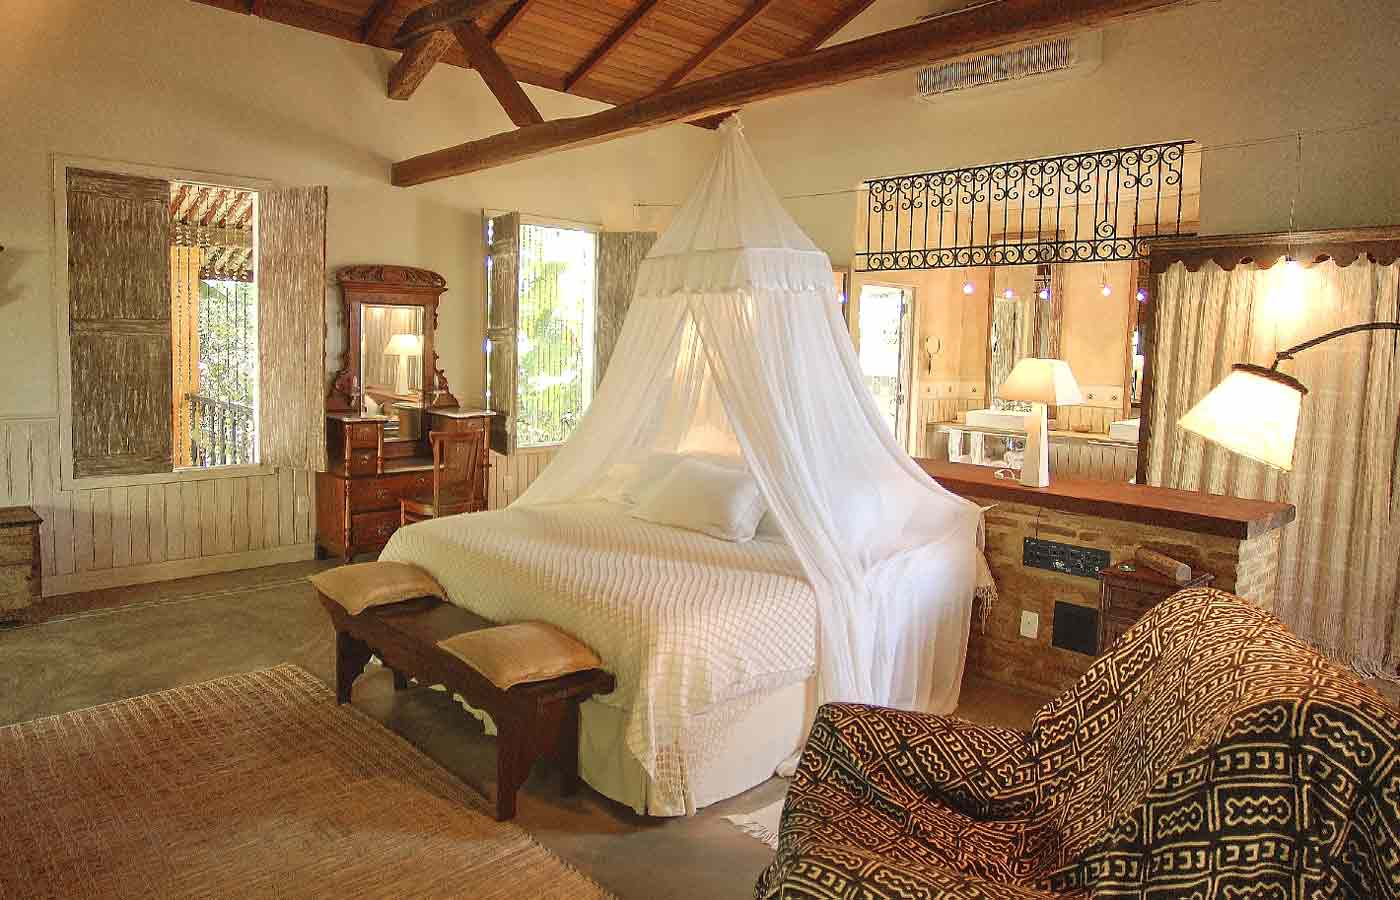 Hotel Toca da Coruja- Luxury holiday to Praia da Pipa, Brazil